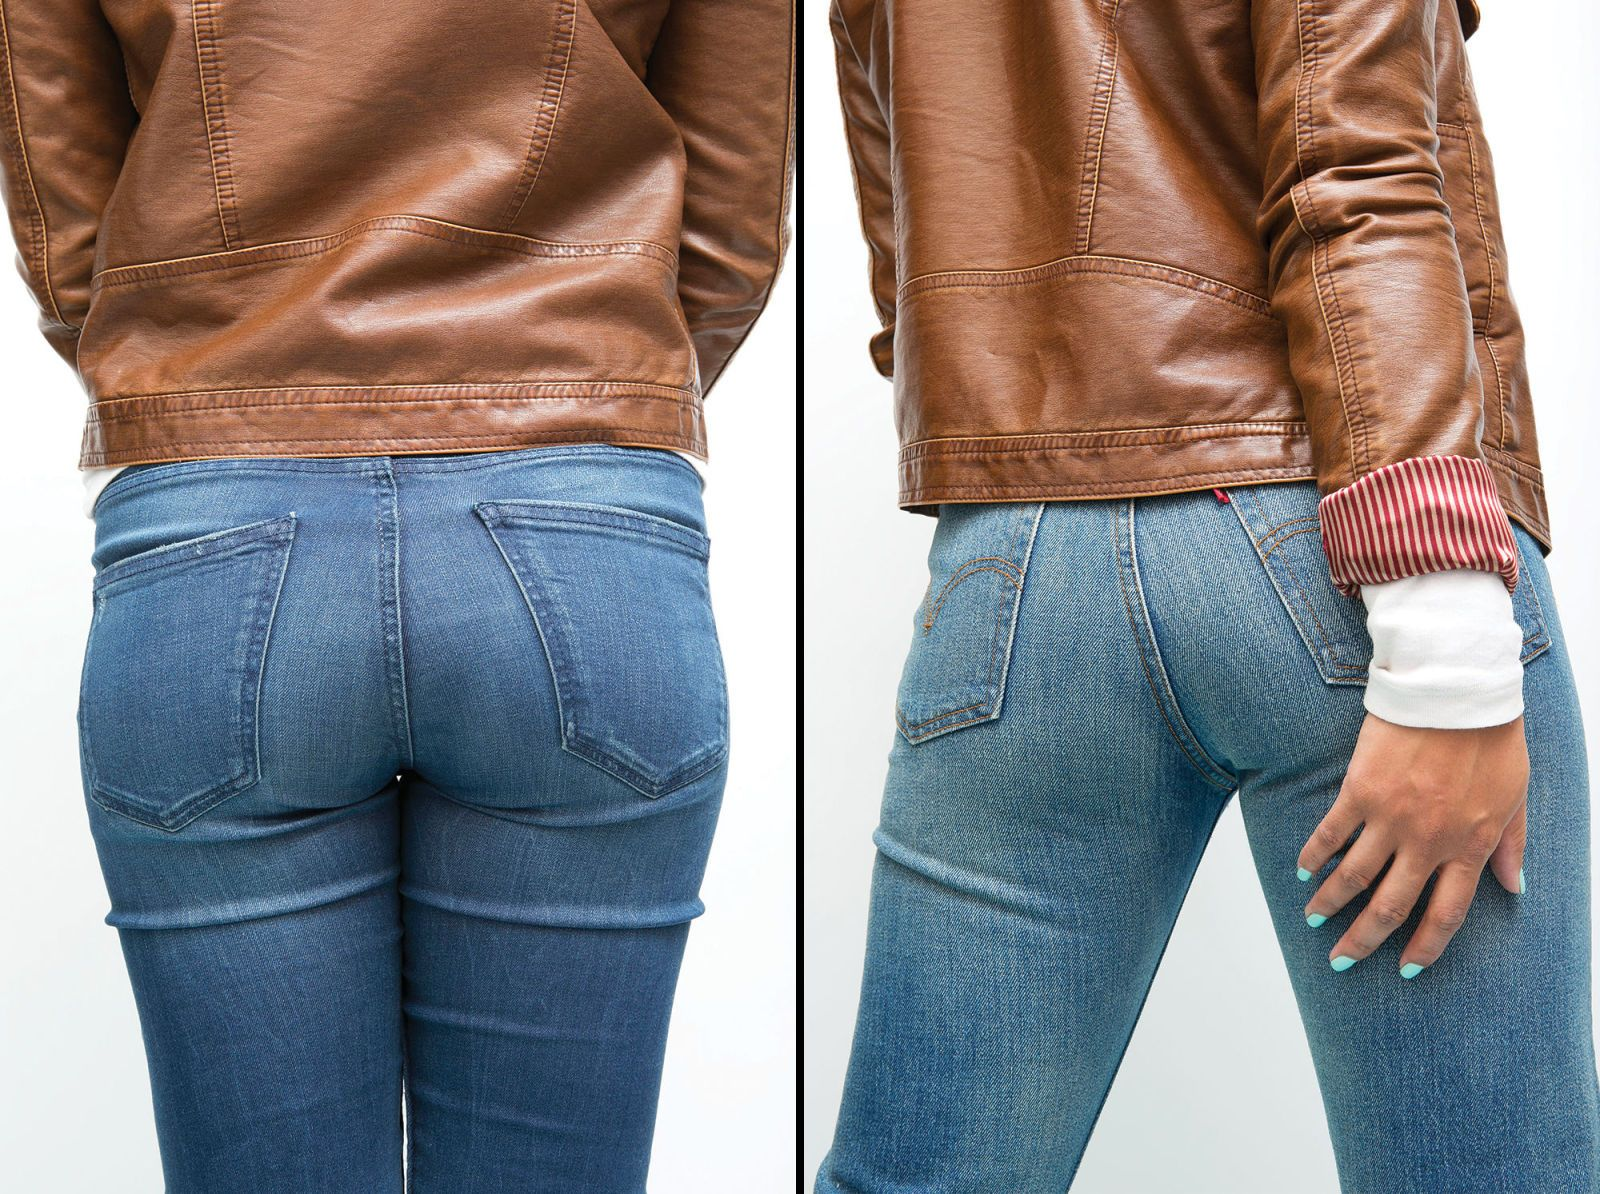 Nice milf booty cheek in jeans shorts